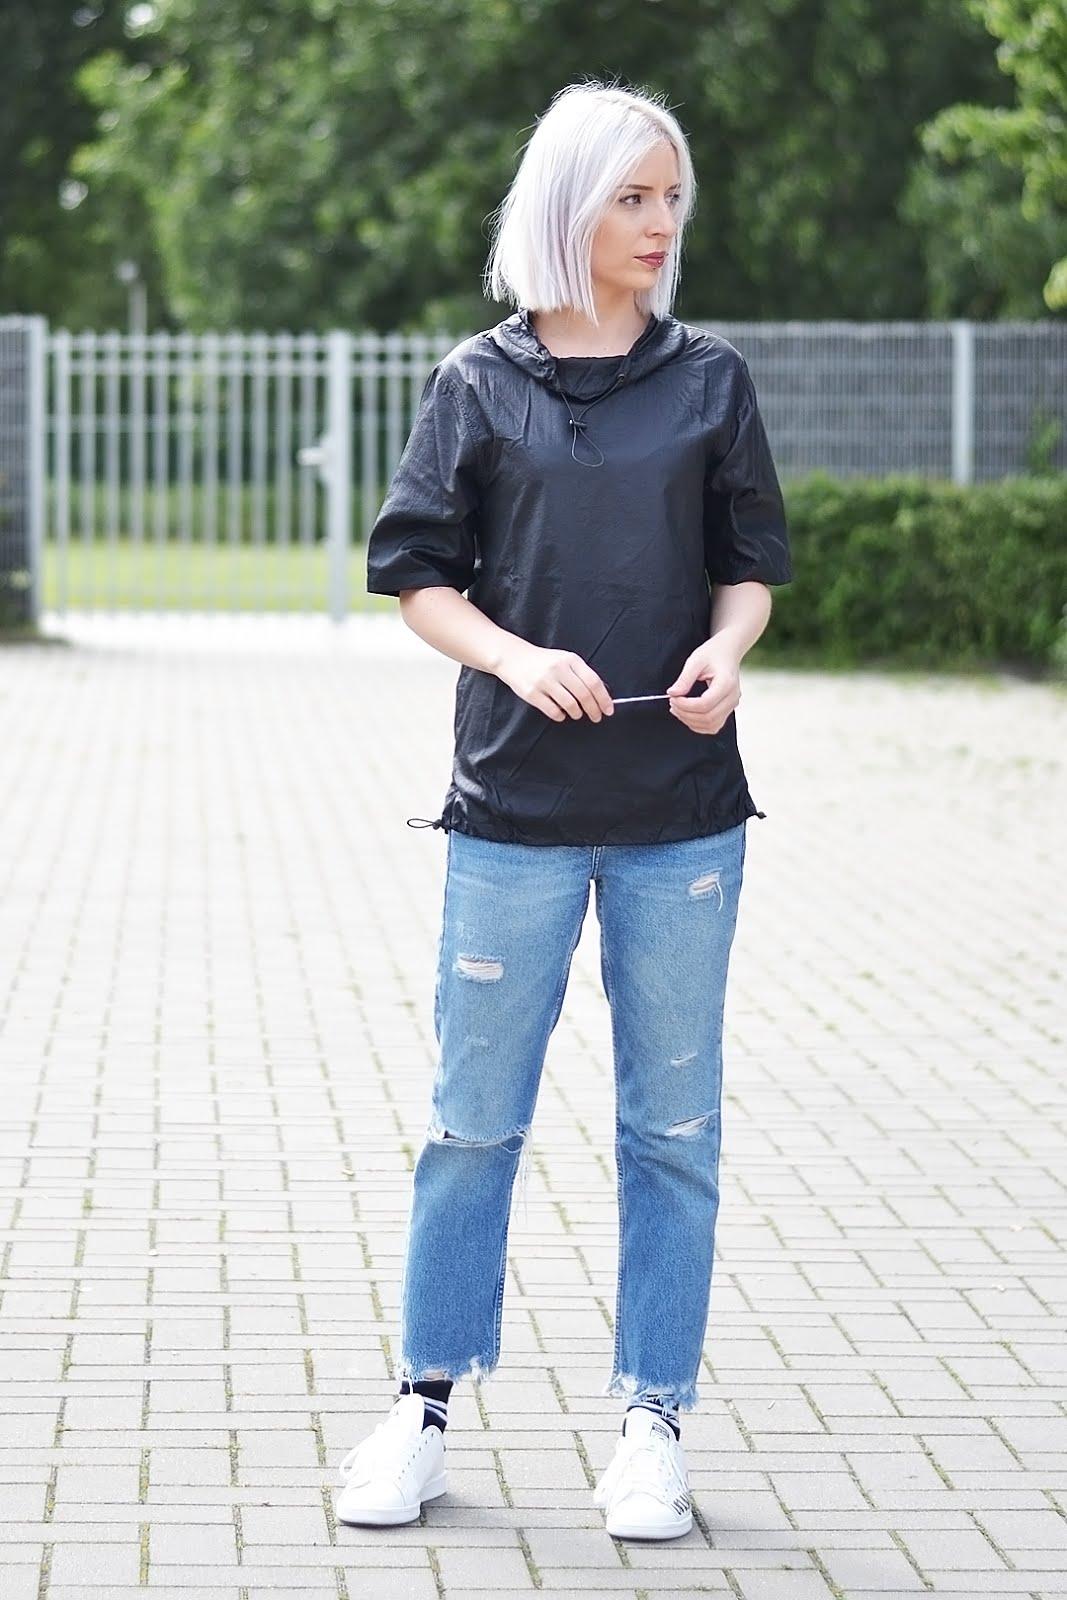 Polyamide top, weekday, mango ripped jeans, stan smith sneakers, zalando blogger awards, street style, fashion blogger, beglium